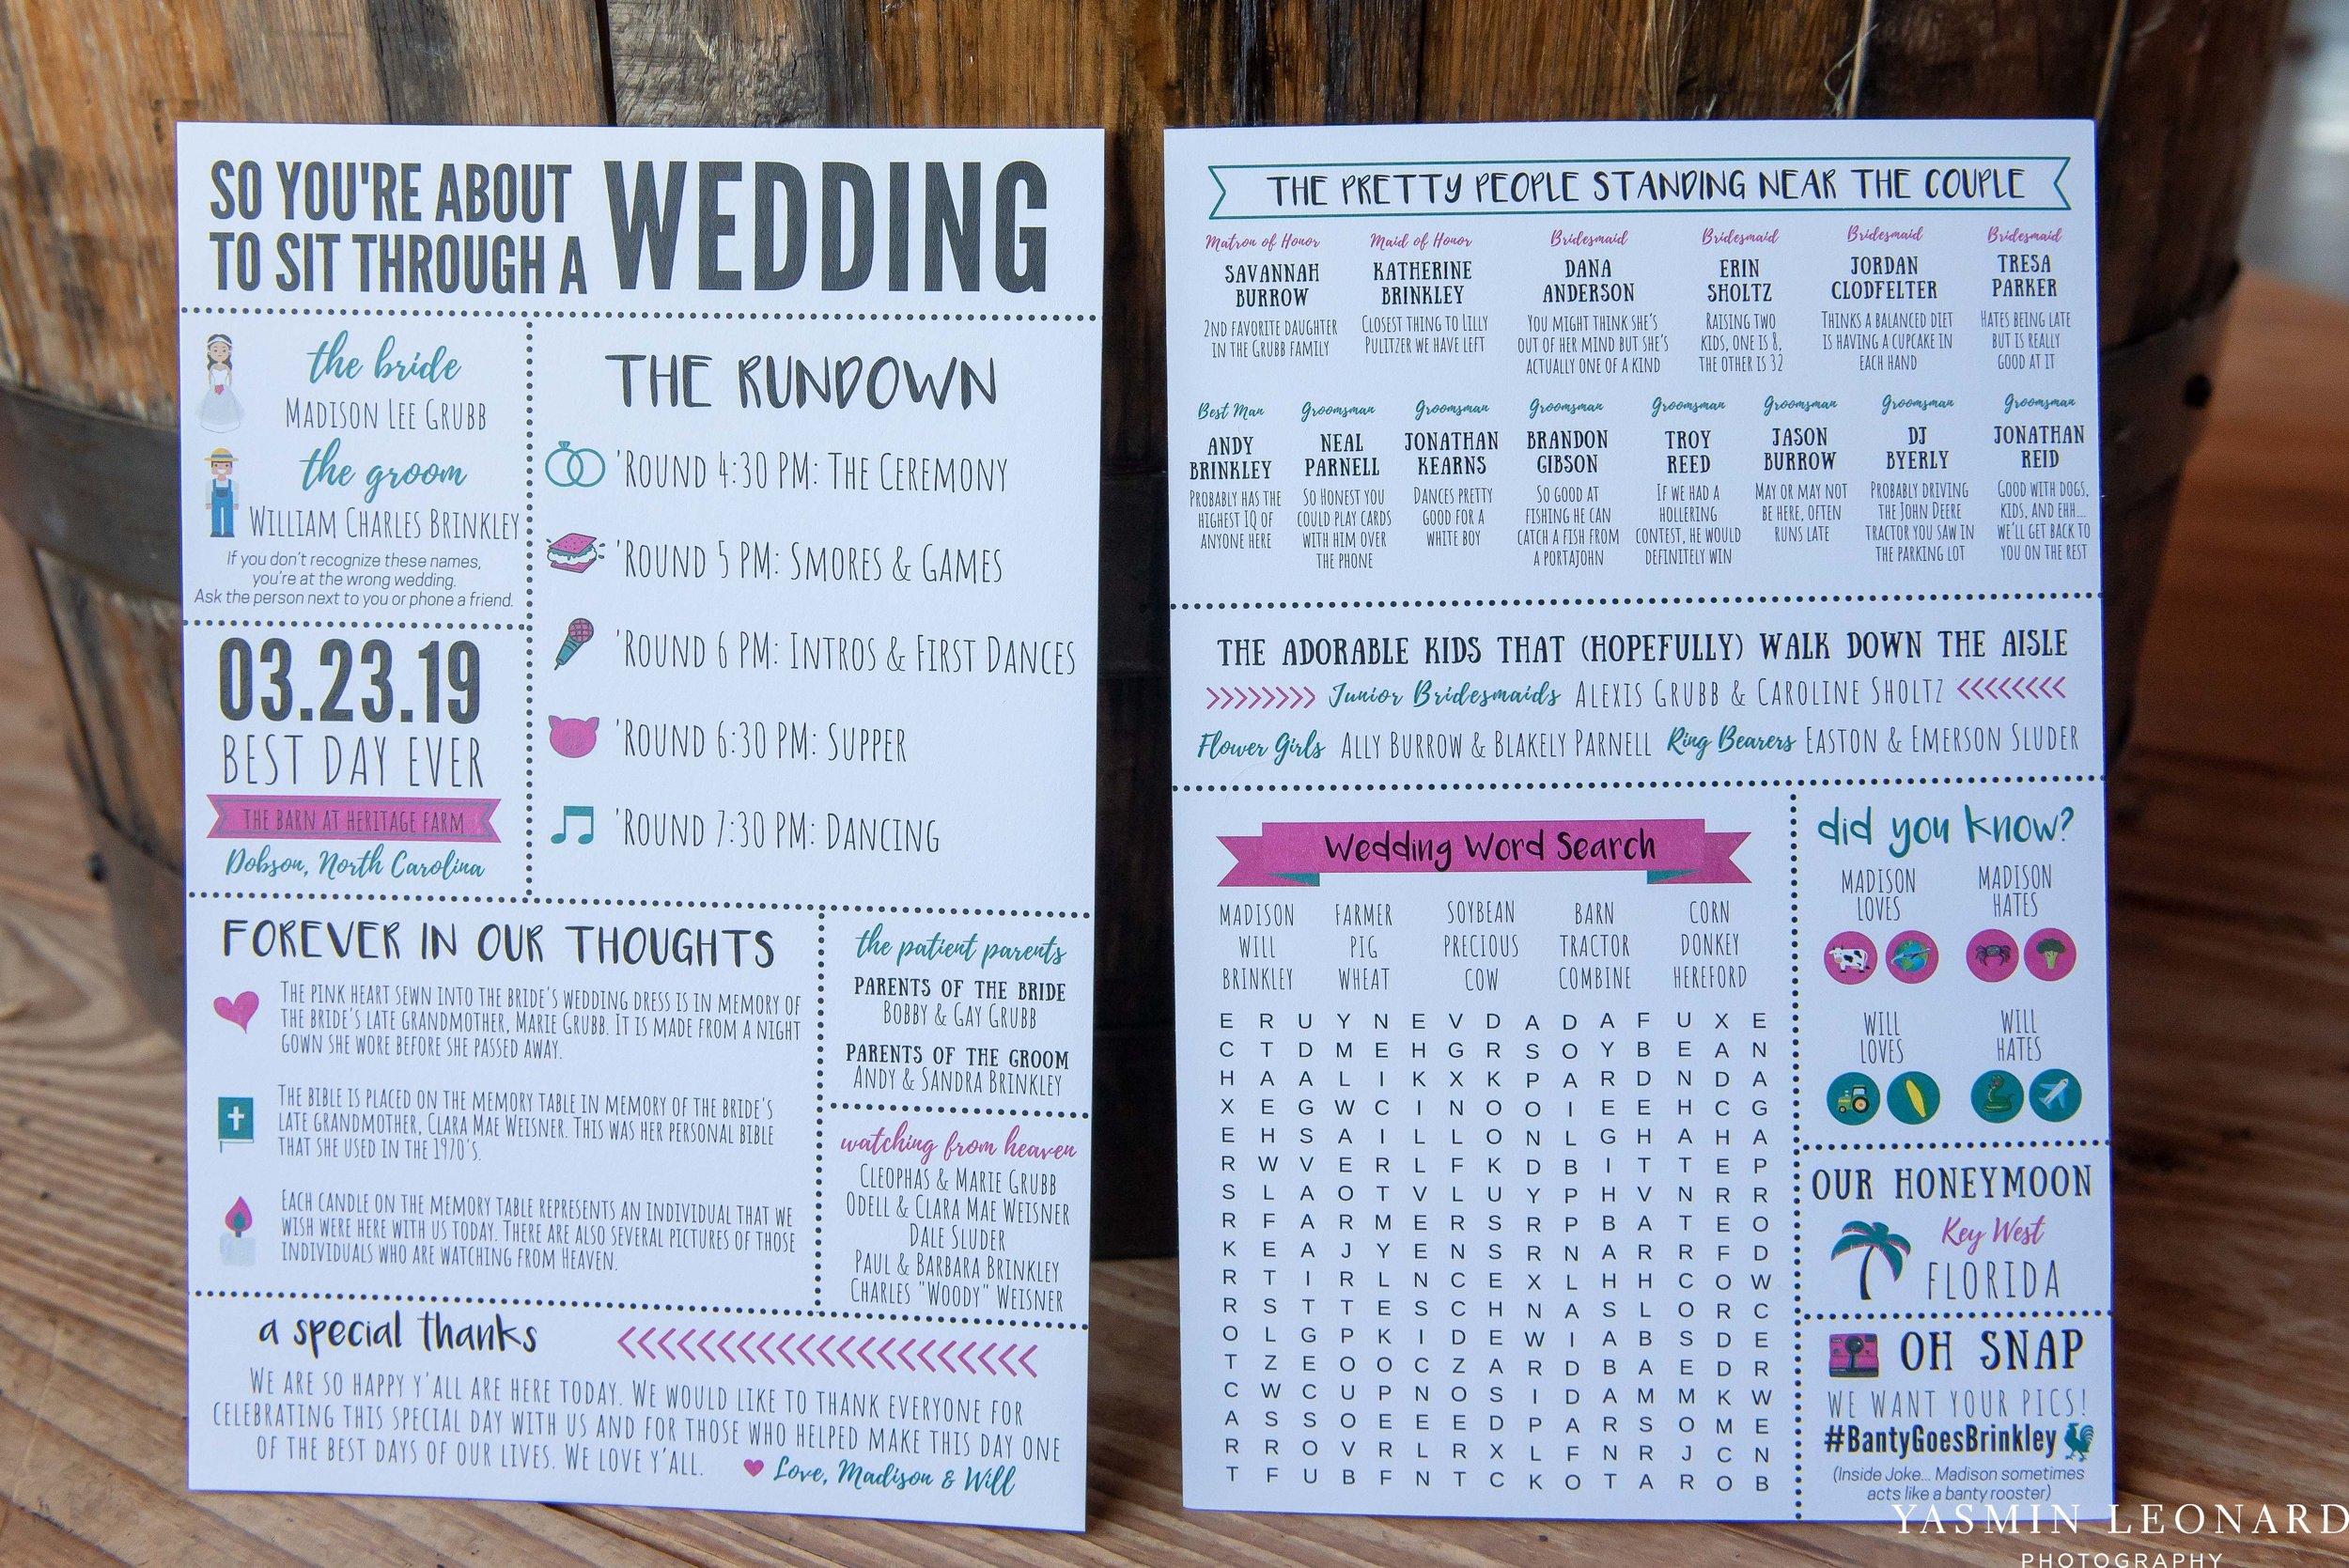 The Barn at Heritage Farm - Country Wedding - Pink and Blue Wedding - Barn Wedding - Outdoor Wedding - Cotton and Wheat Decor - Groom in Bibs - Pink Bridal Colors - Yasmin Leonard Photography-4.jpg